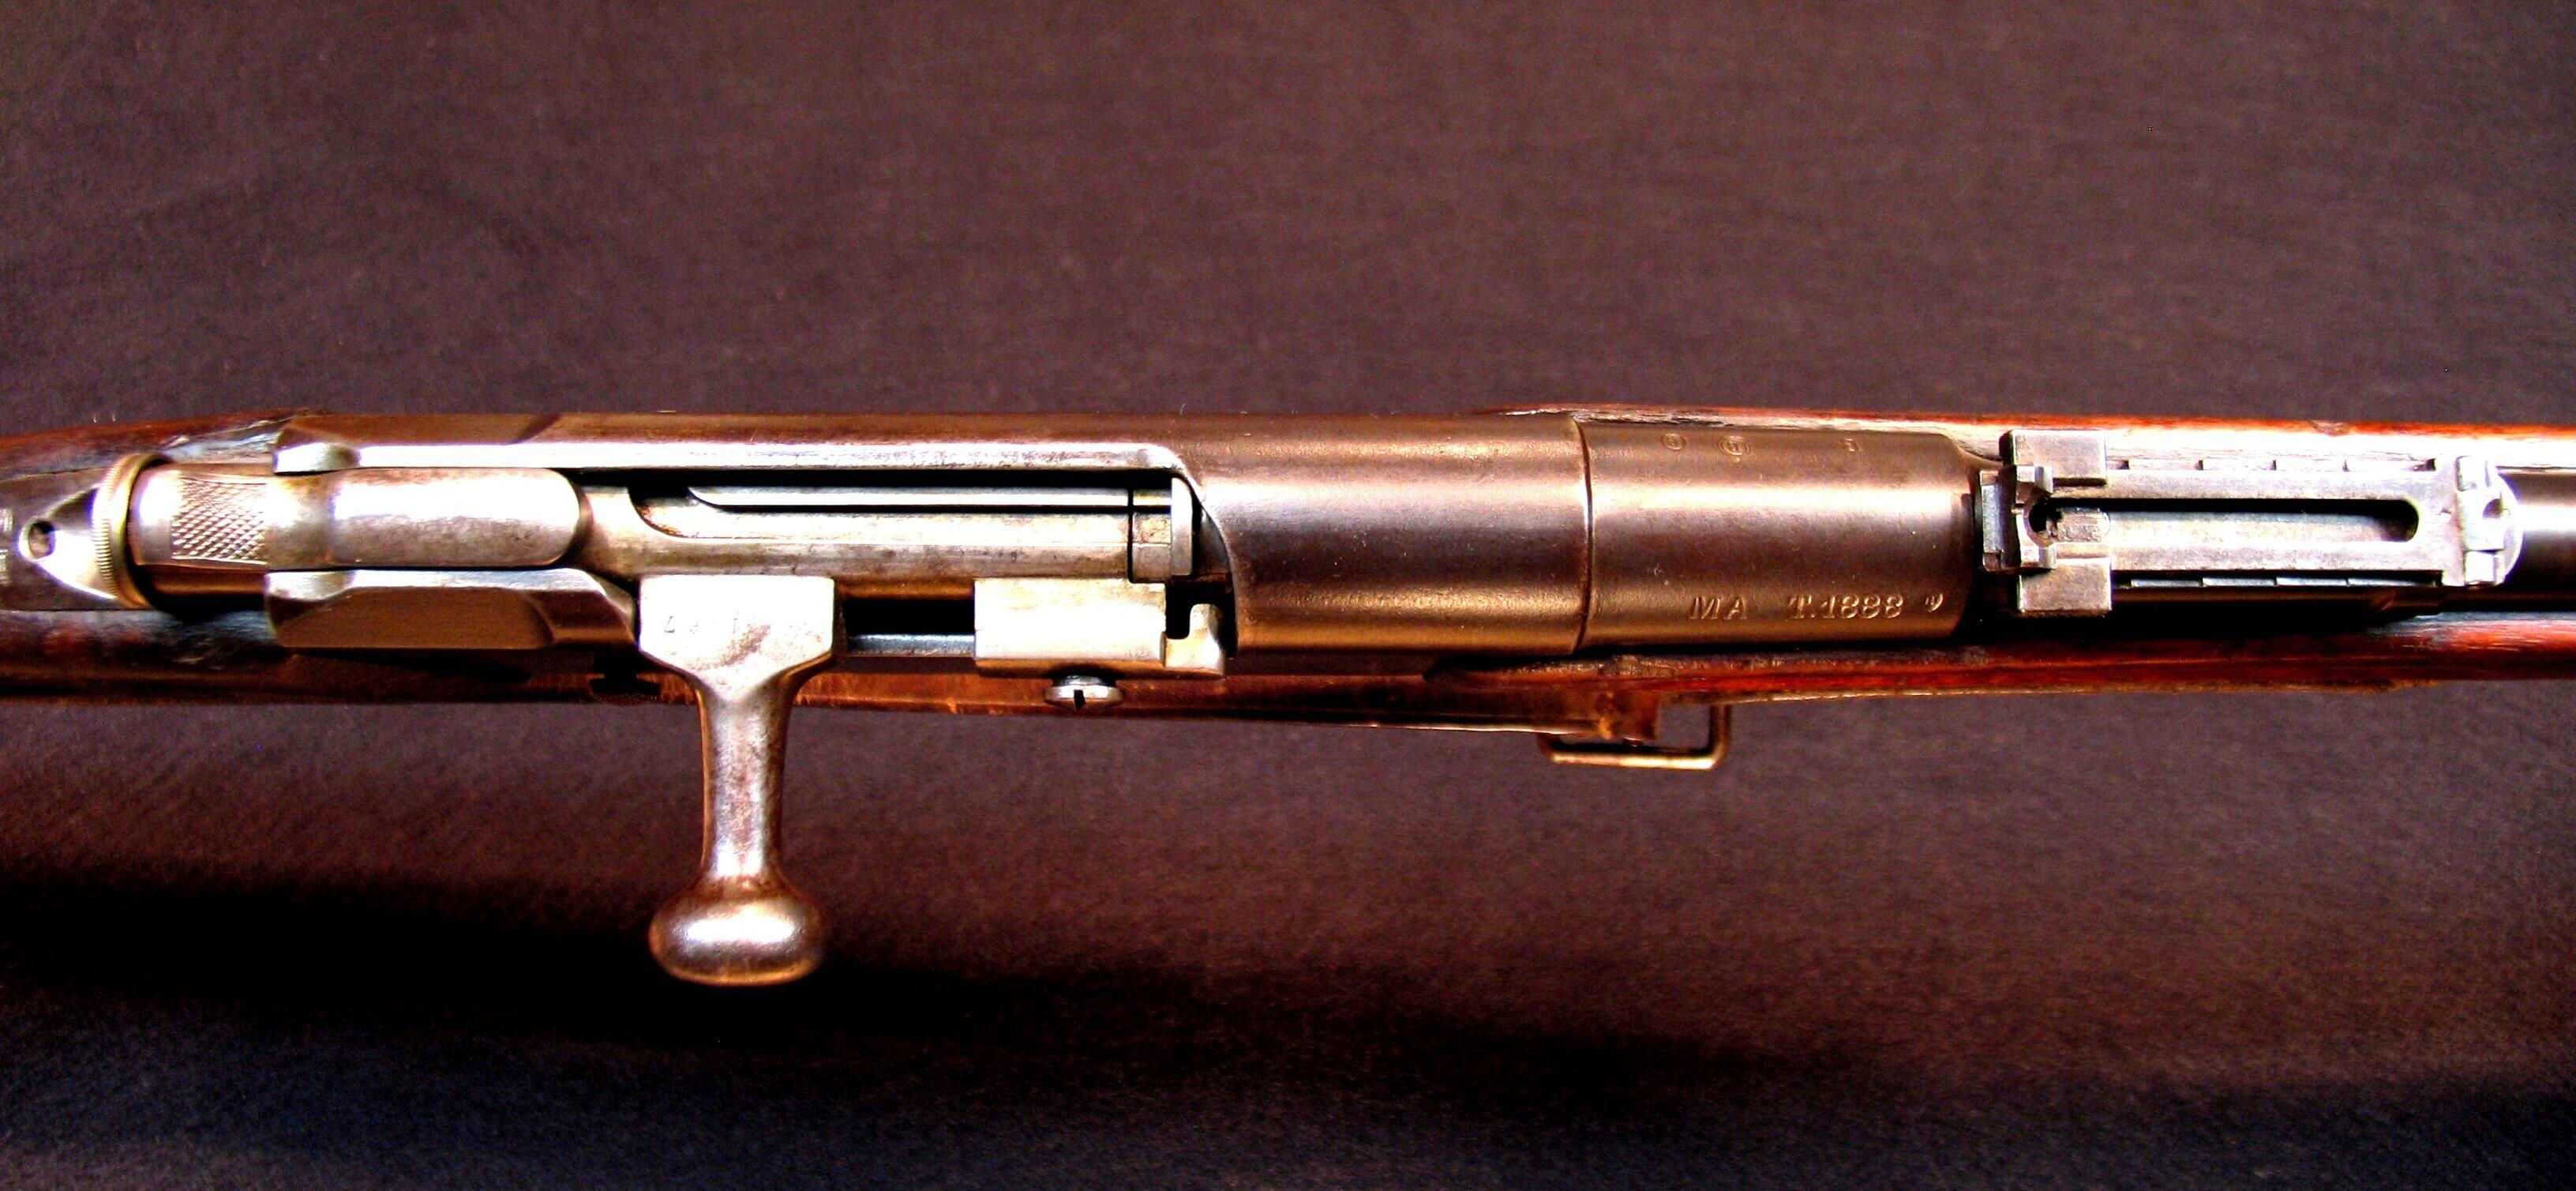 Click image for larger version.  Name:Mle 1886 Lebel Rifle 01B (3).jpg Views:3 Size:767.9 KB ID:3667277